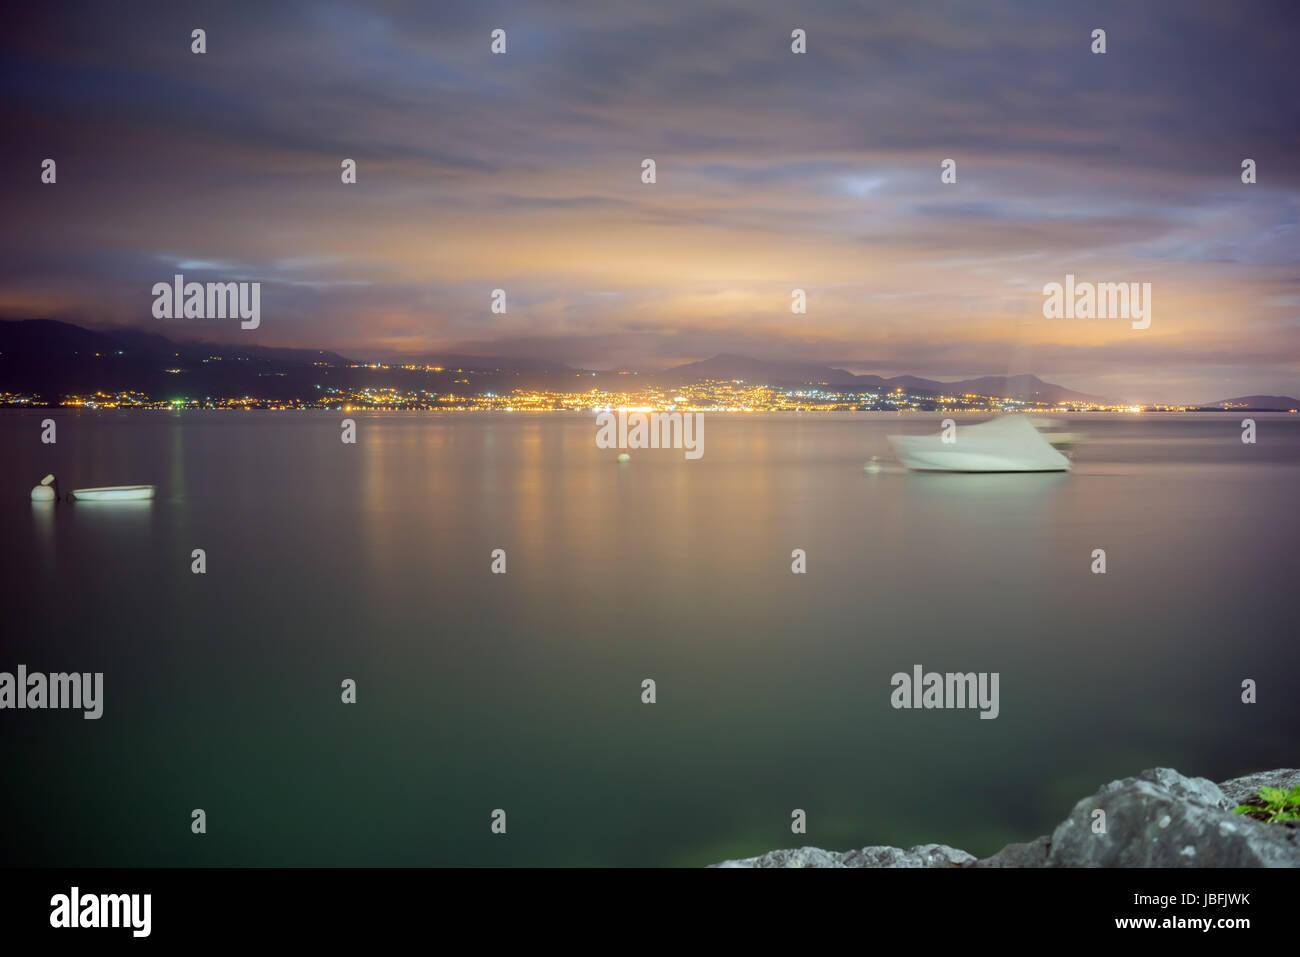 Nightfall by Lake Leman (Lake Geneva) in Switzerland - Stock Image